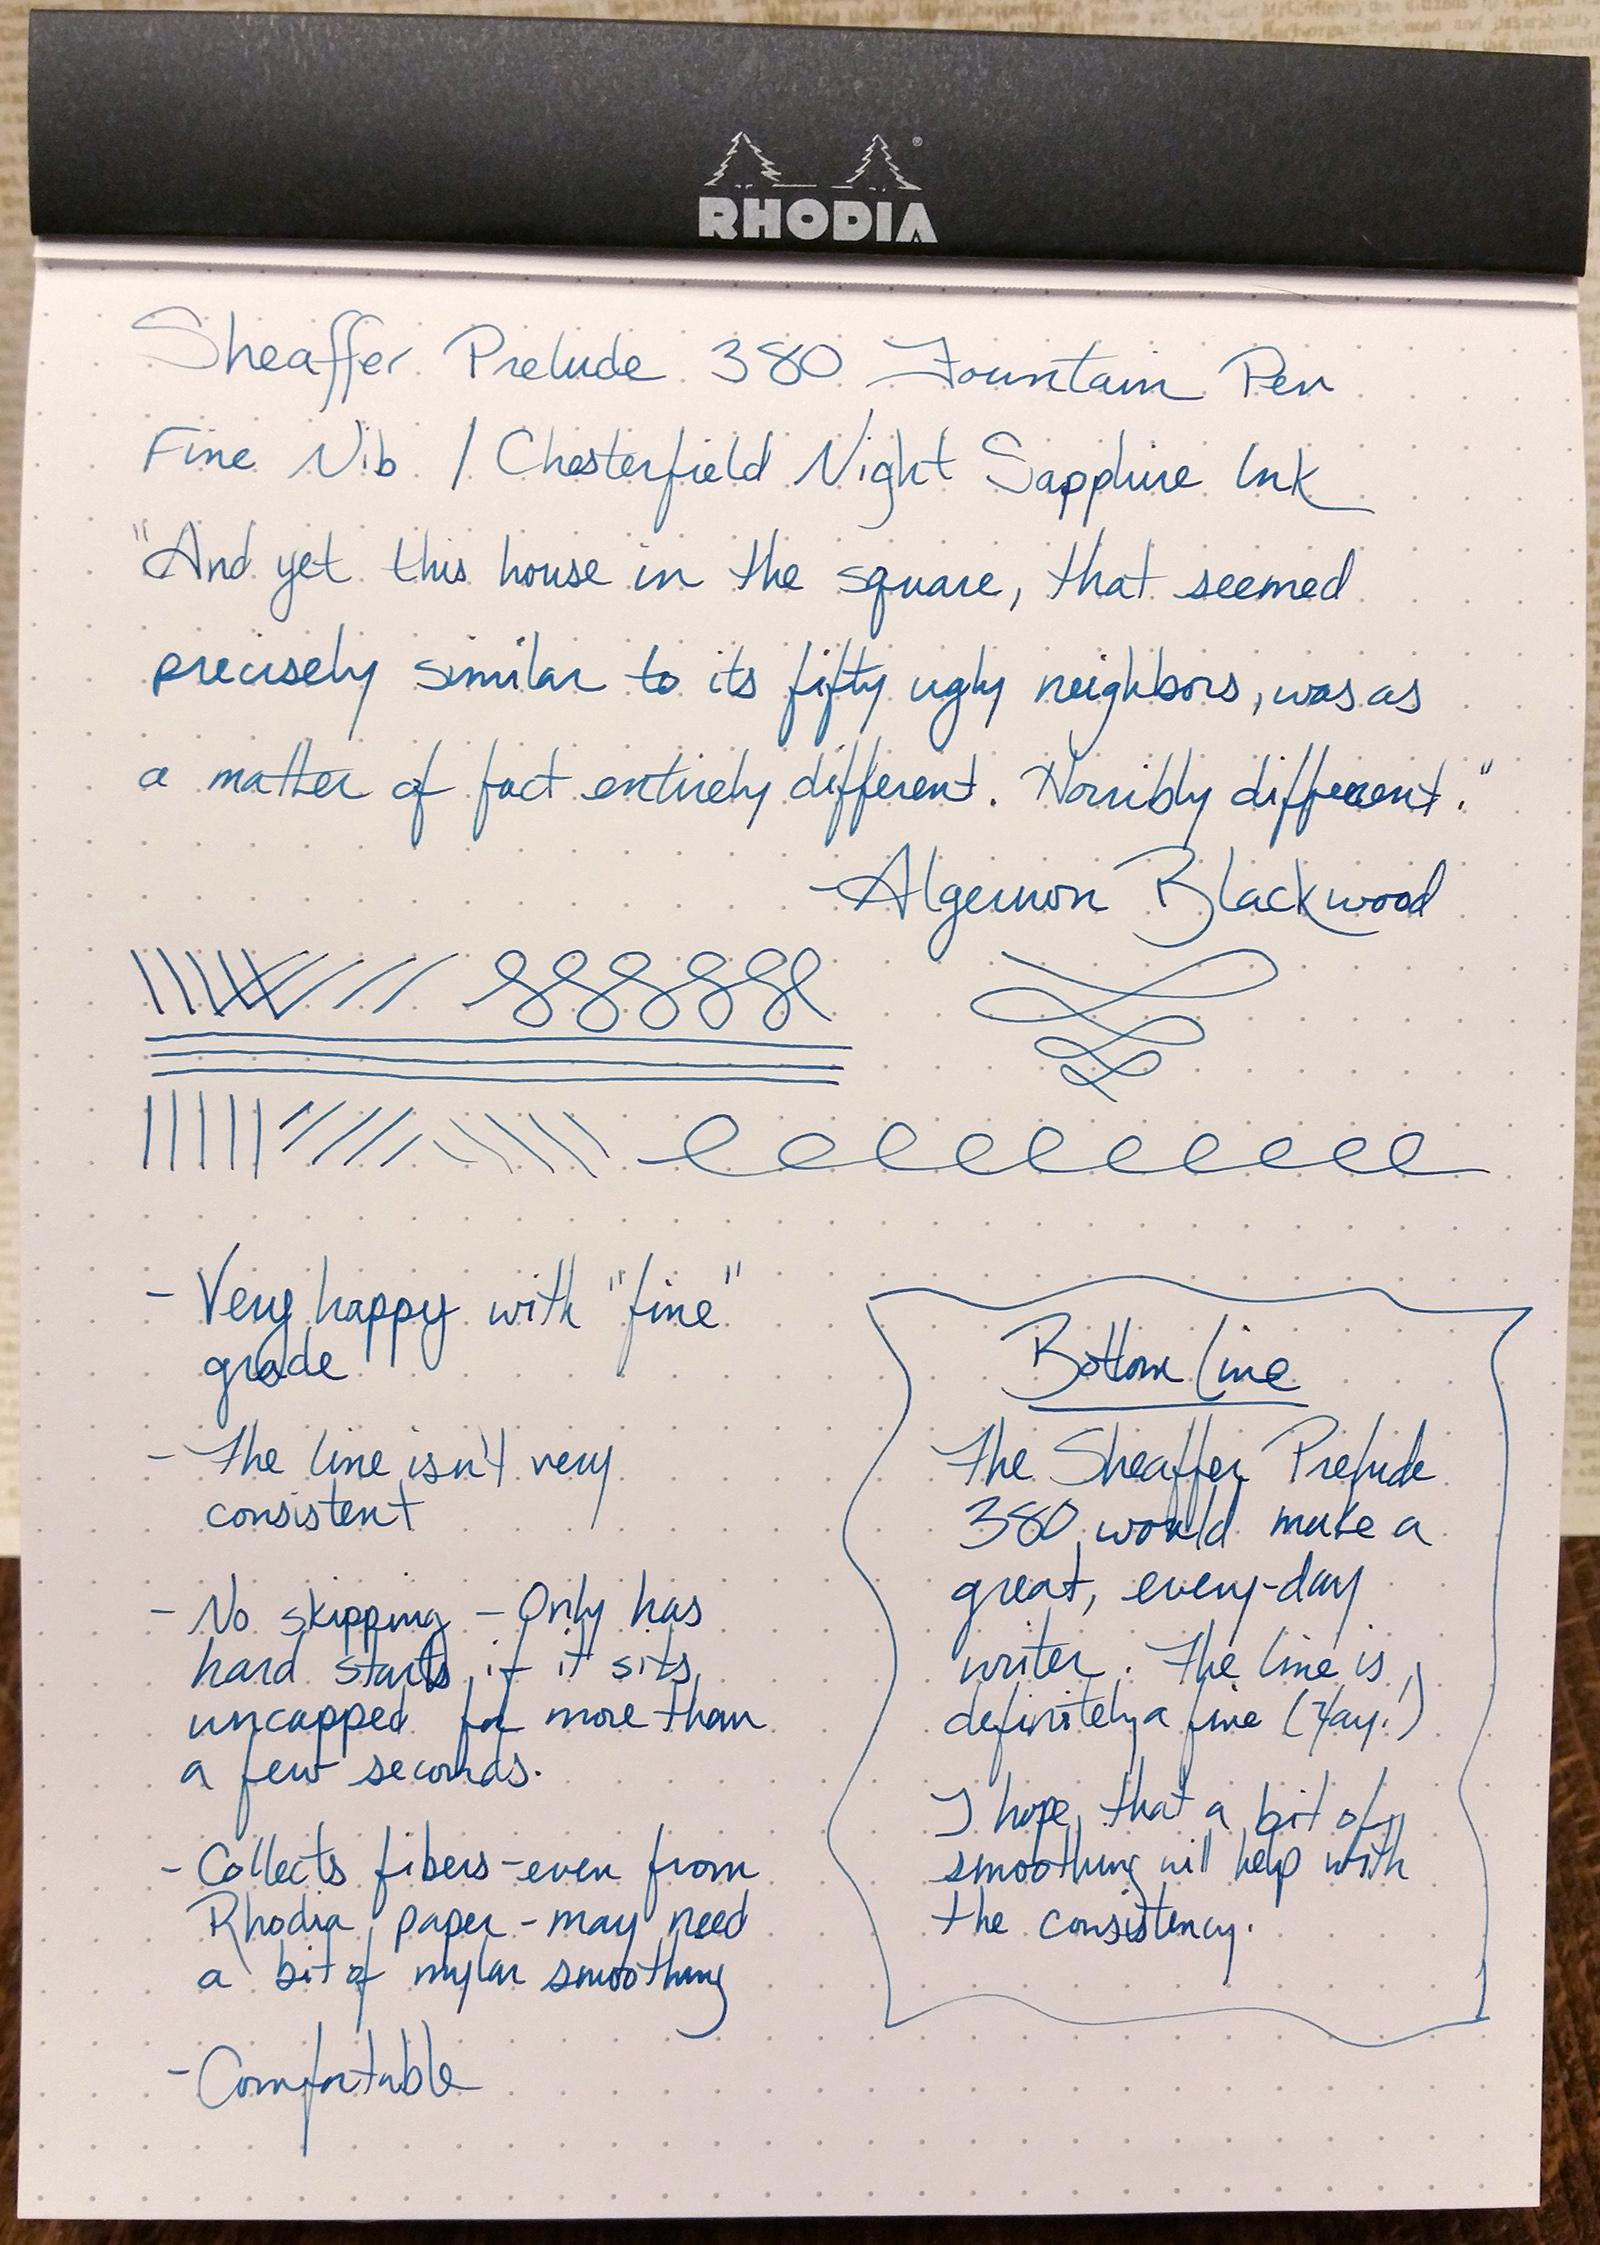 Sheaffer Prelude 380 Fountain Pen Writing Sample